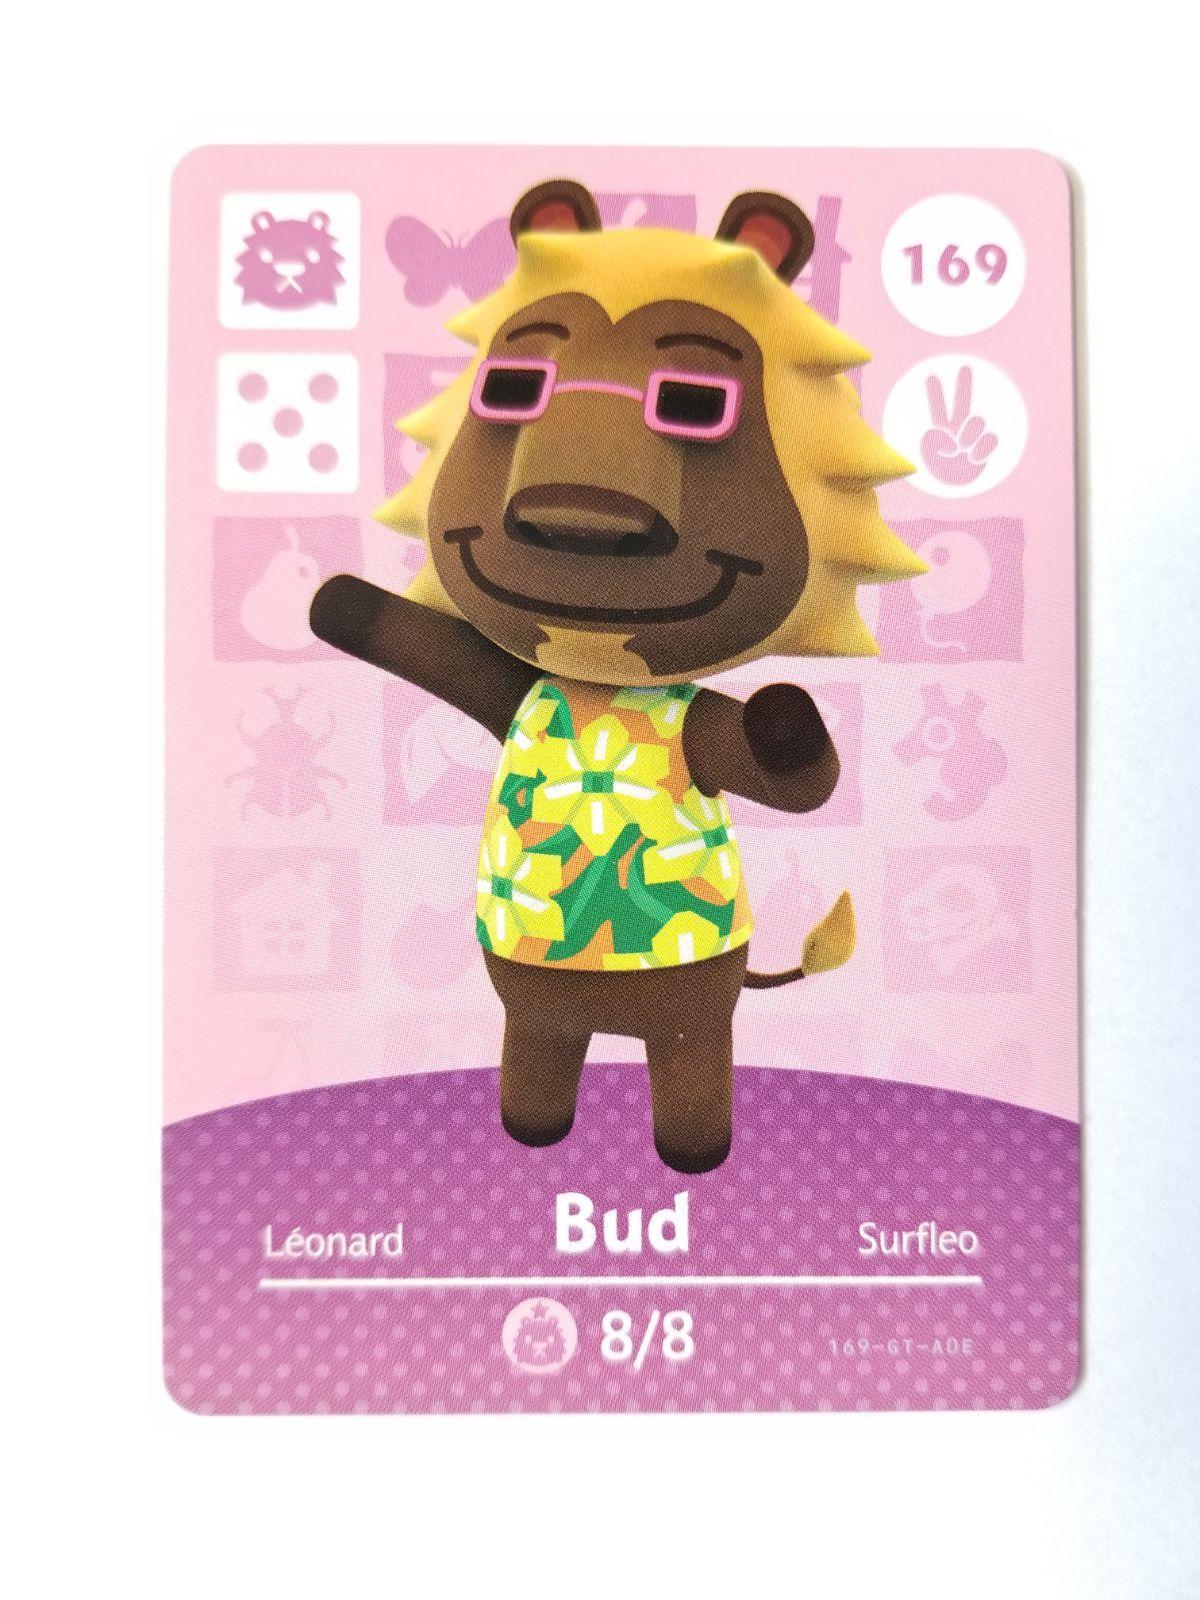 Animal Crossing Amiibo Card Bud 169 Mercari In 2020 Animal